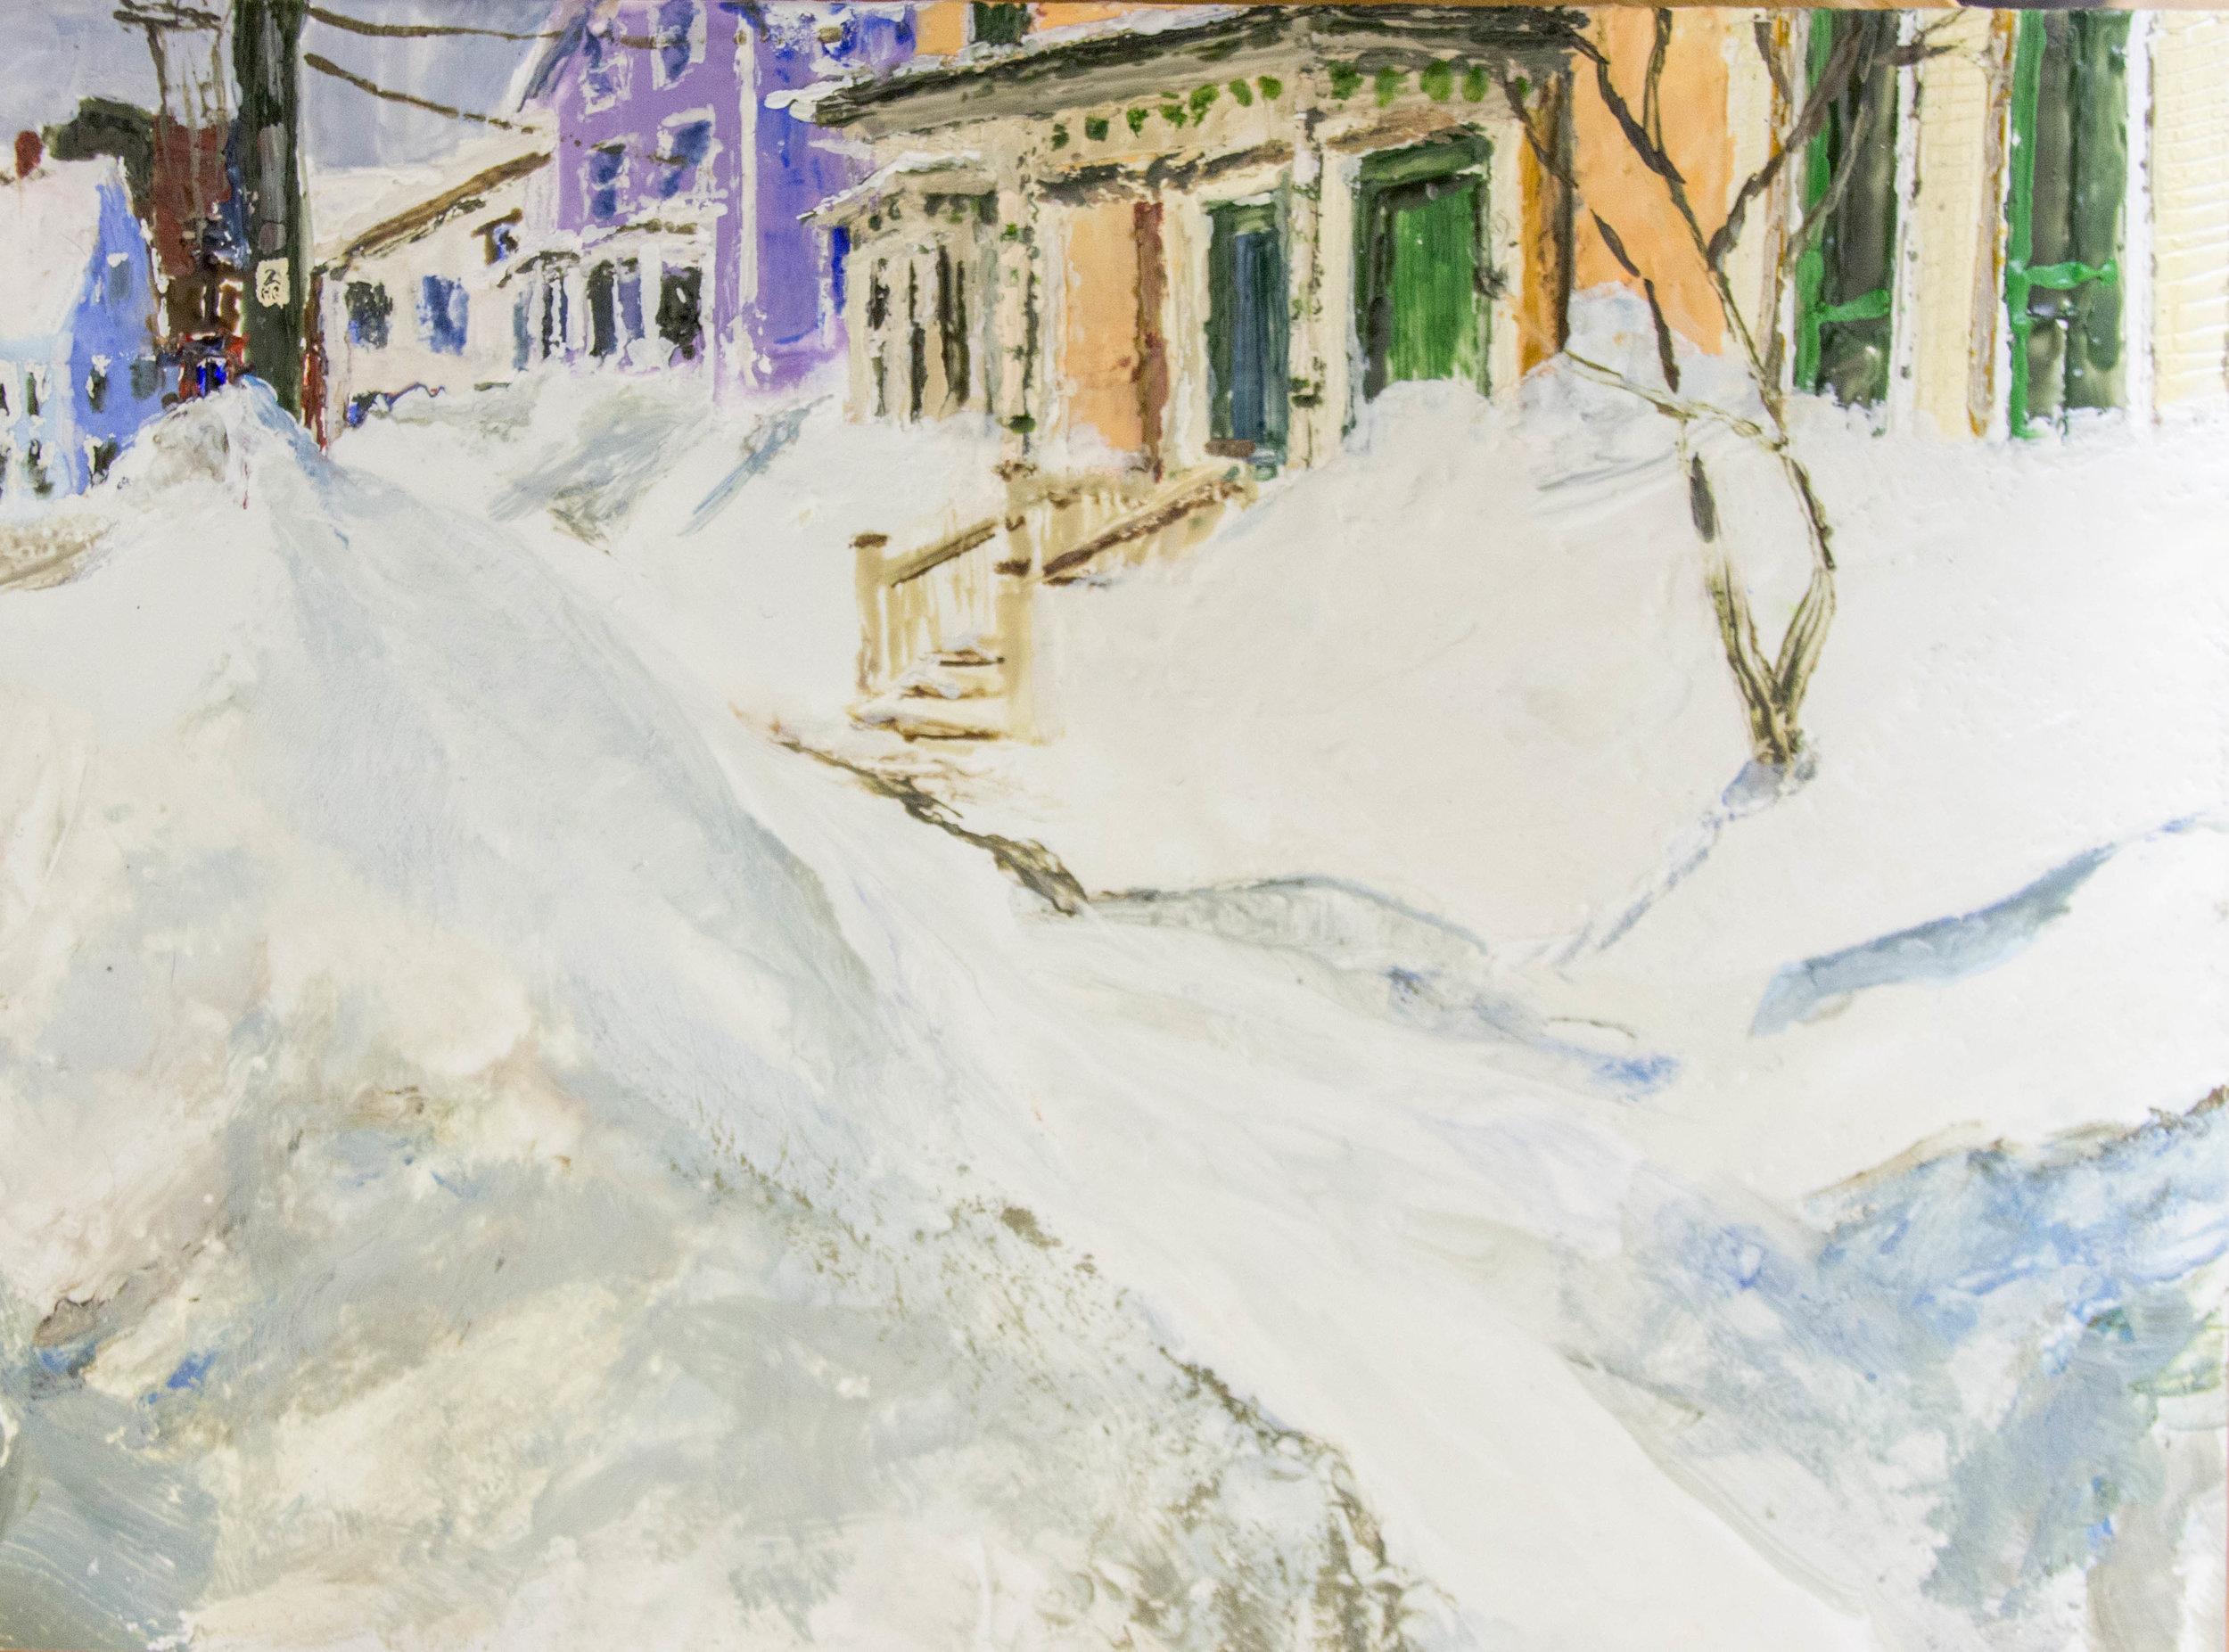 Big Snow, encaustic